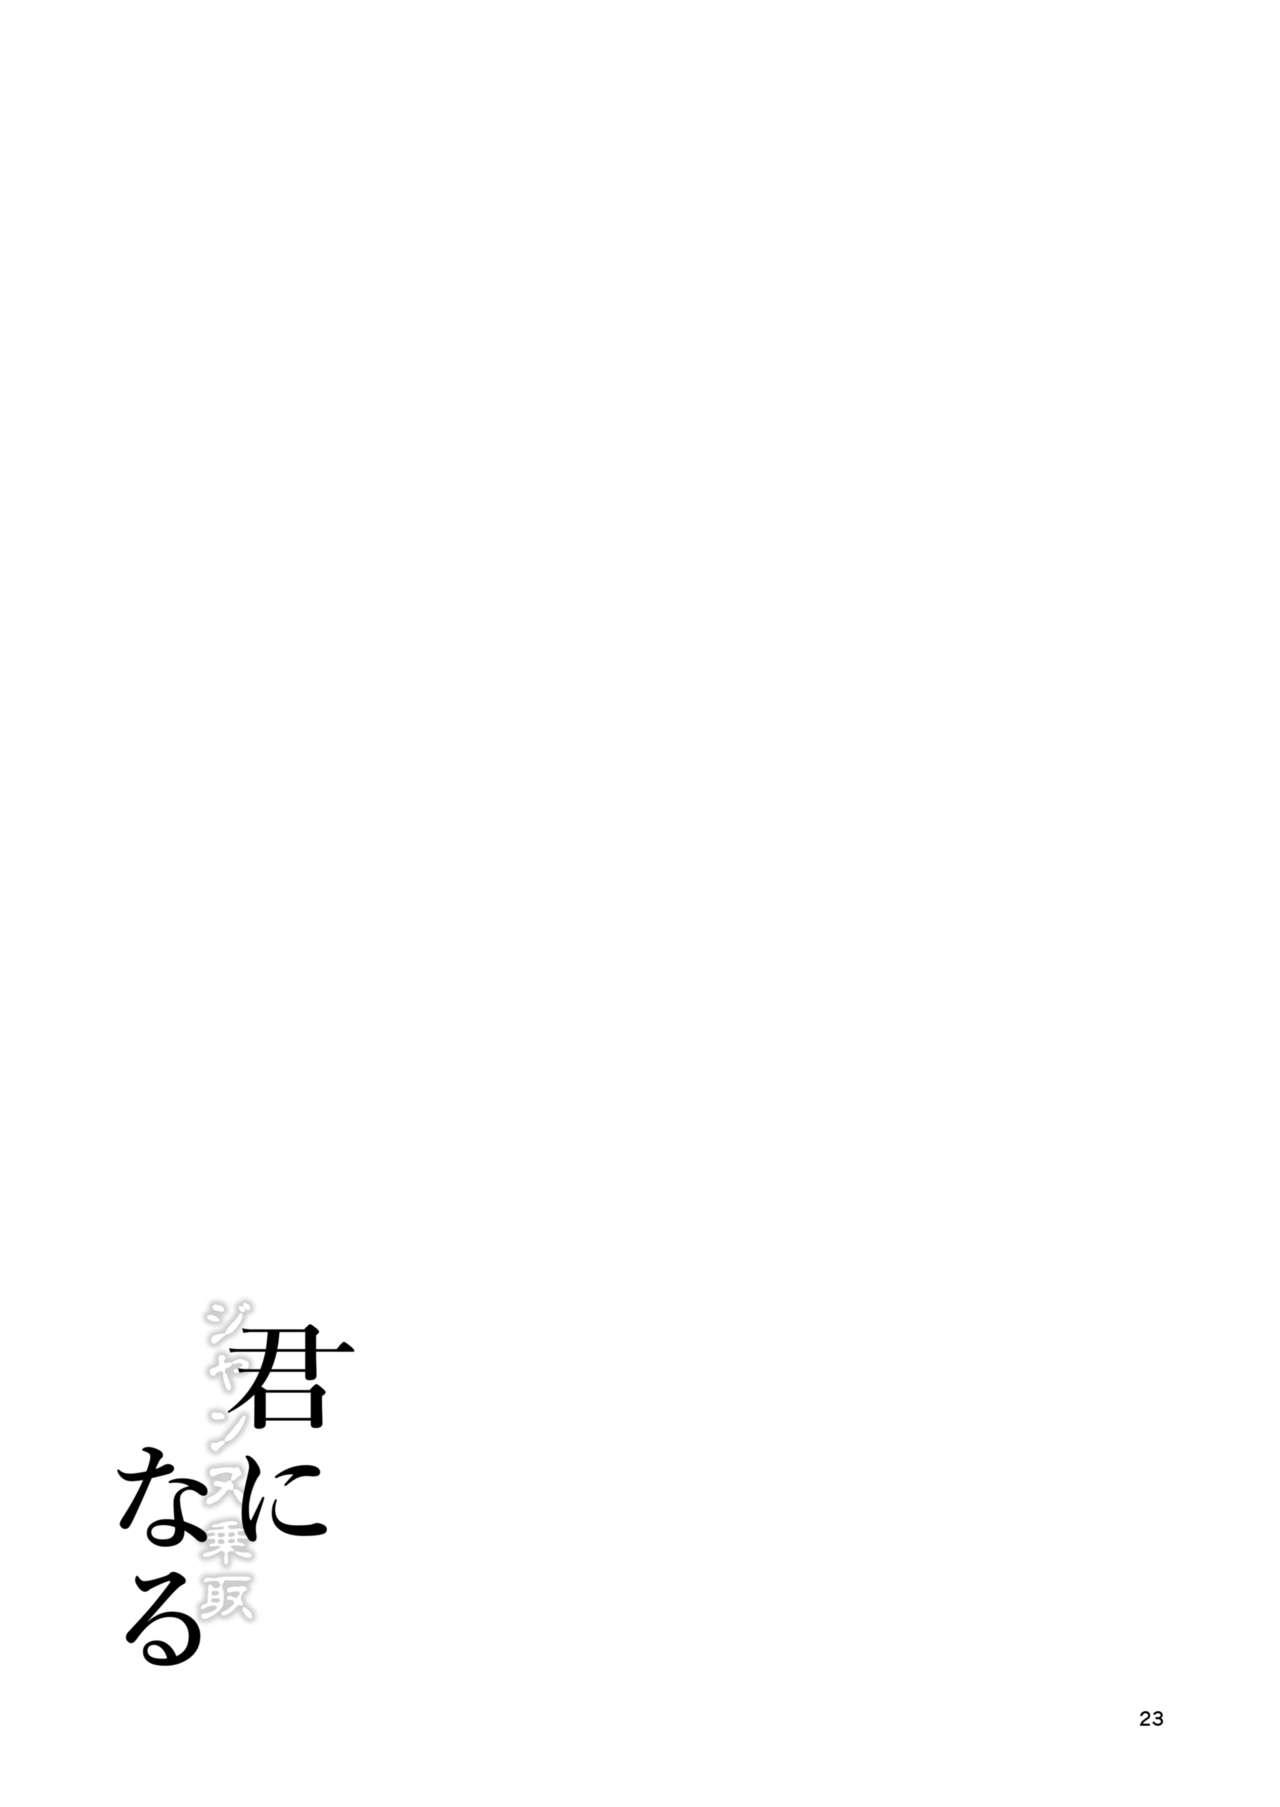 [Dschinghis Khan no Tamanegi wa Ore no Yome (Taniguchi-san)] Kimi -Jeanne d'Arc- ni Naru 2 (Fate/Grand Order) [Chinese] [熊崎玉子汉化组] [Digital] 23